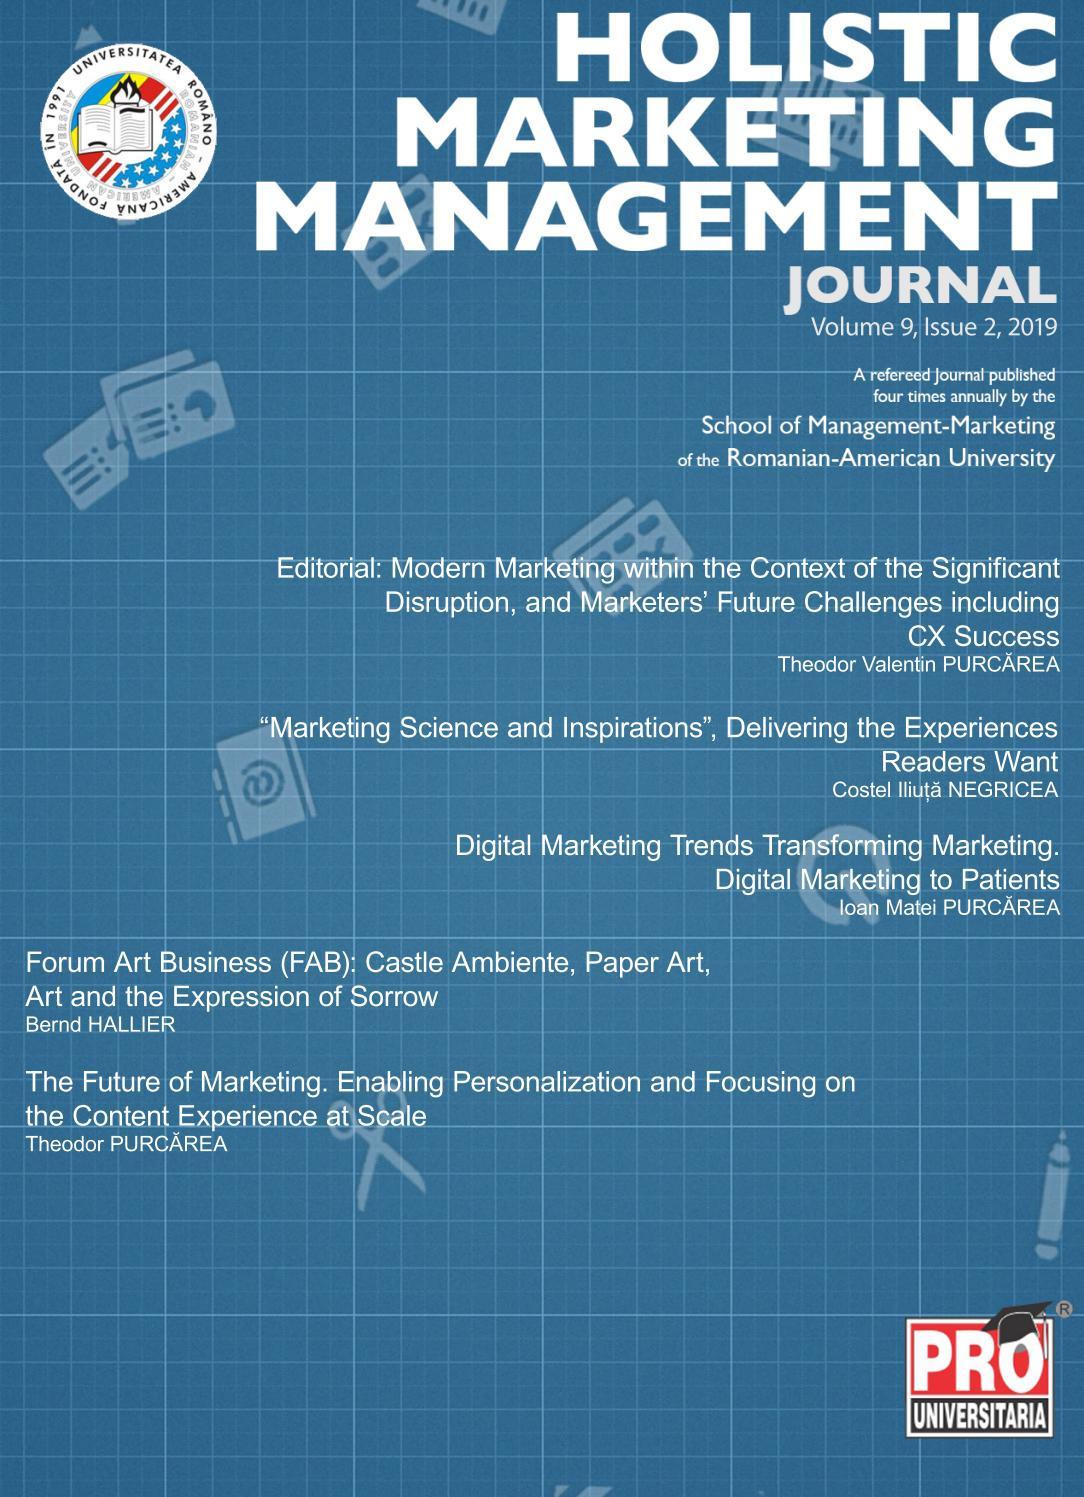 Holistic Marketing Management, Volume 9, Issue 2, Year 2019